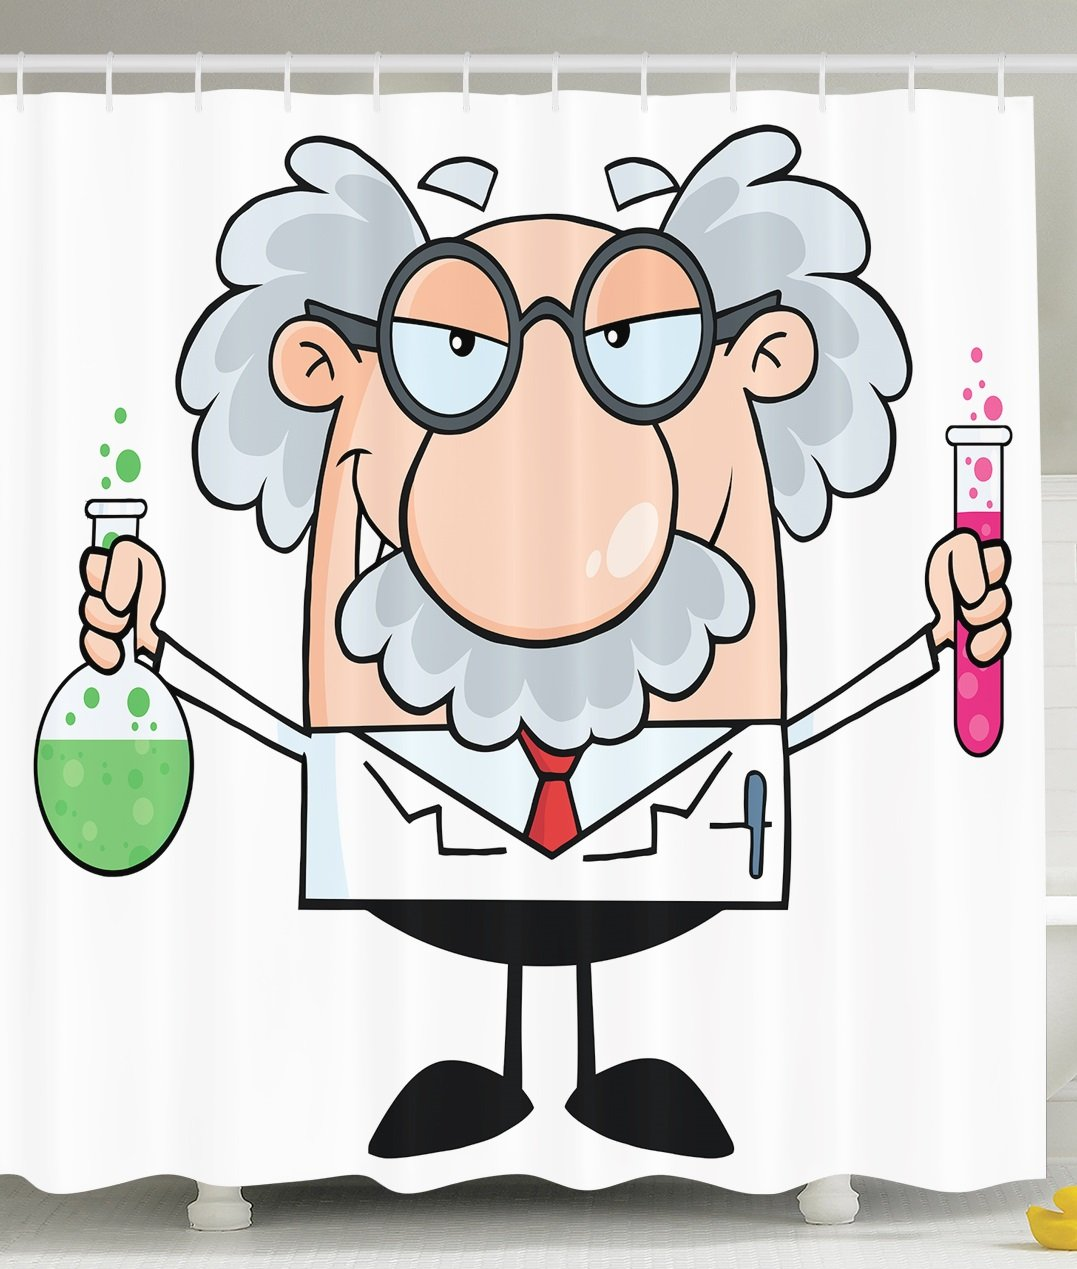 Novelty Fun Shower Curtain PHD Gifts Einstein Cartoon Decorations Funny Science Scientist Chemistry Nobel Physics Modern Bathroom Decor Gifts Professor Teacher Student College Dorm White Pink Green